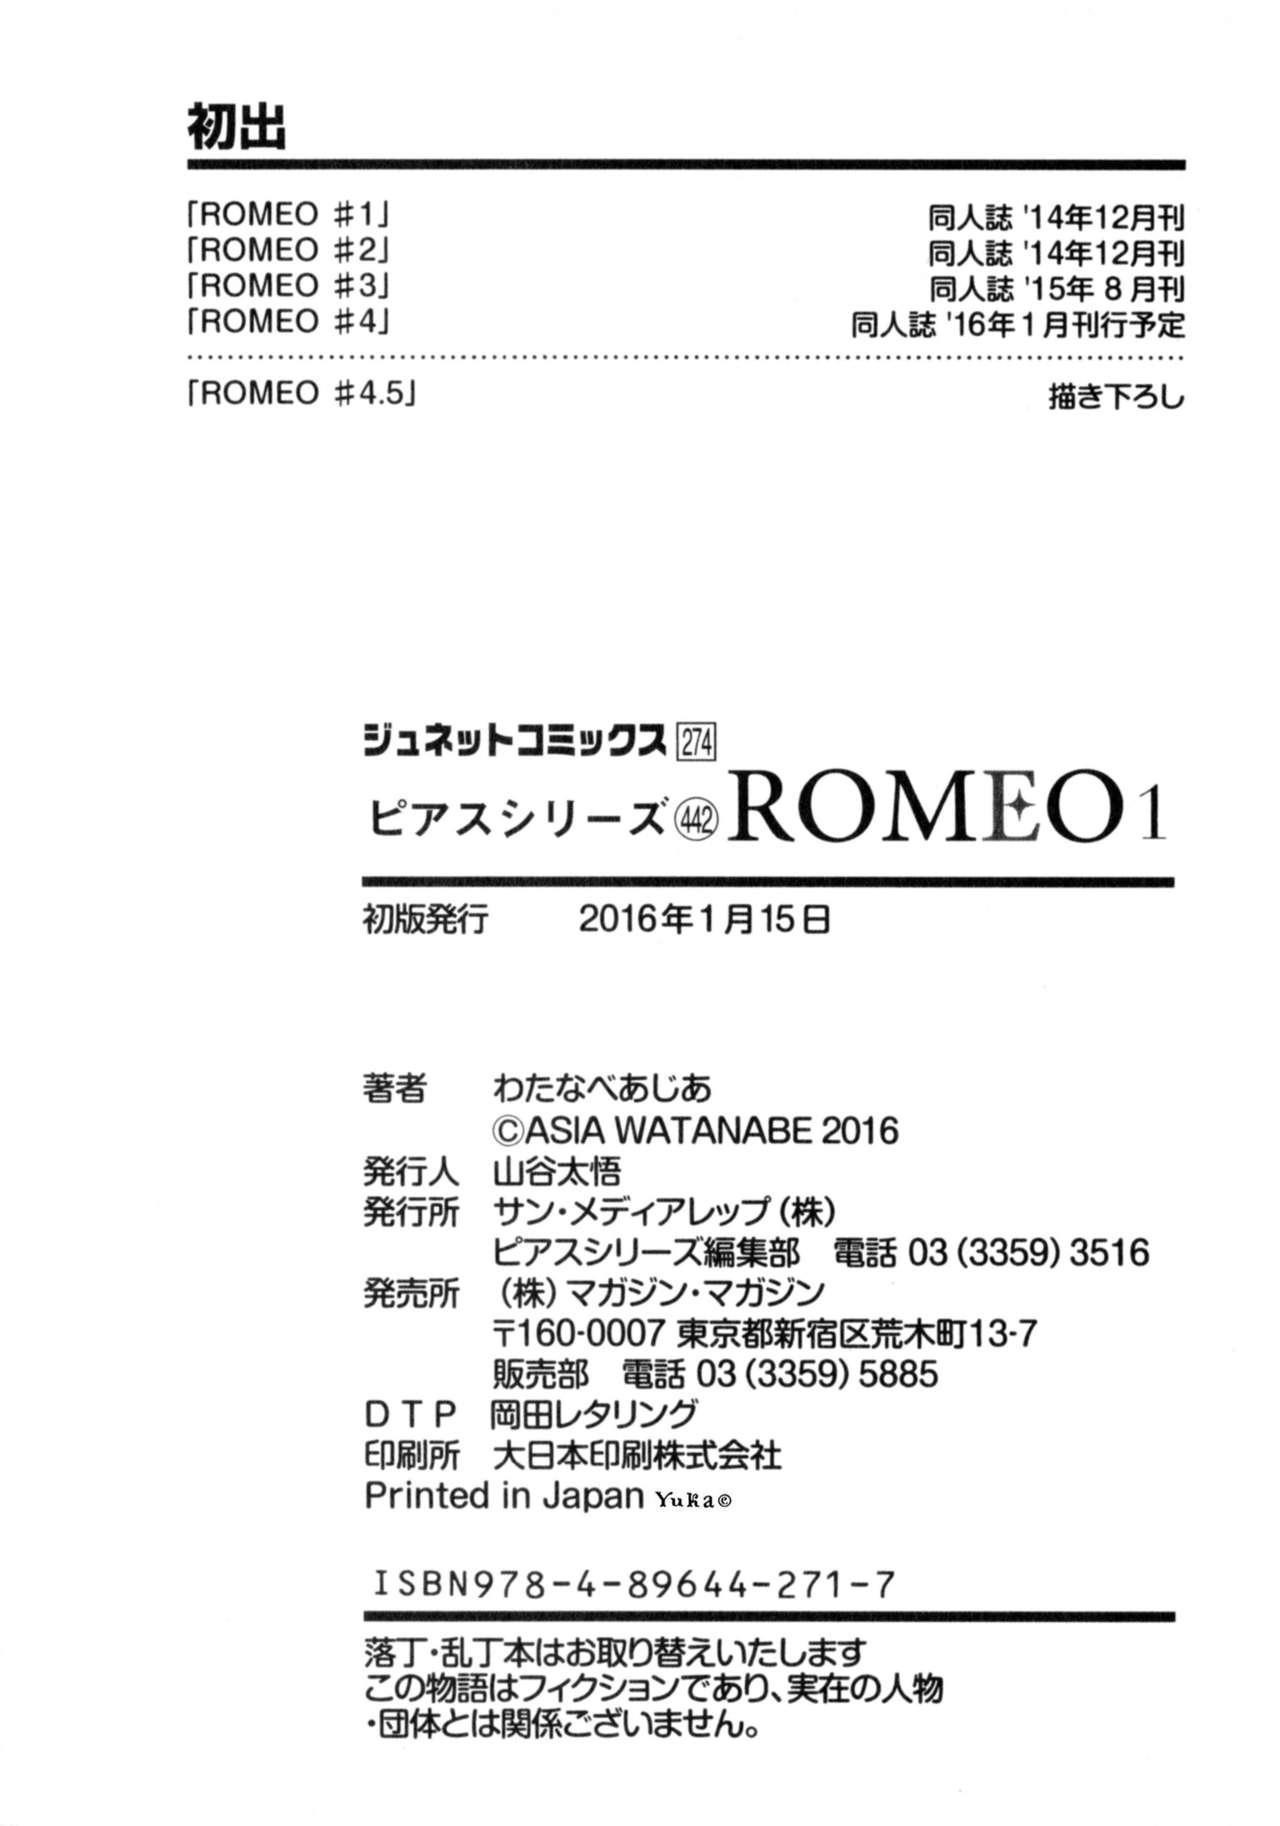 D.S.P Romeo 184